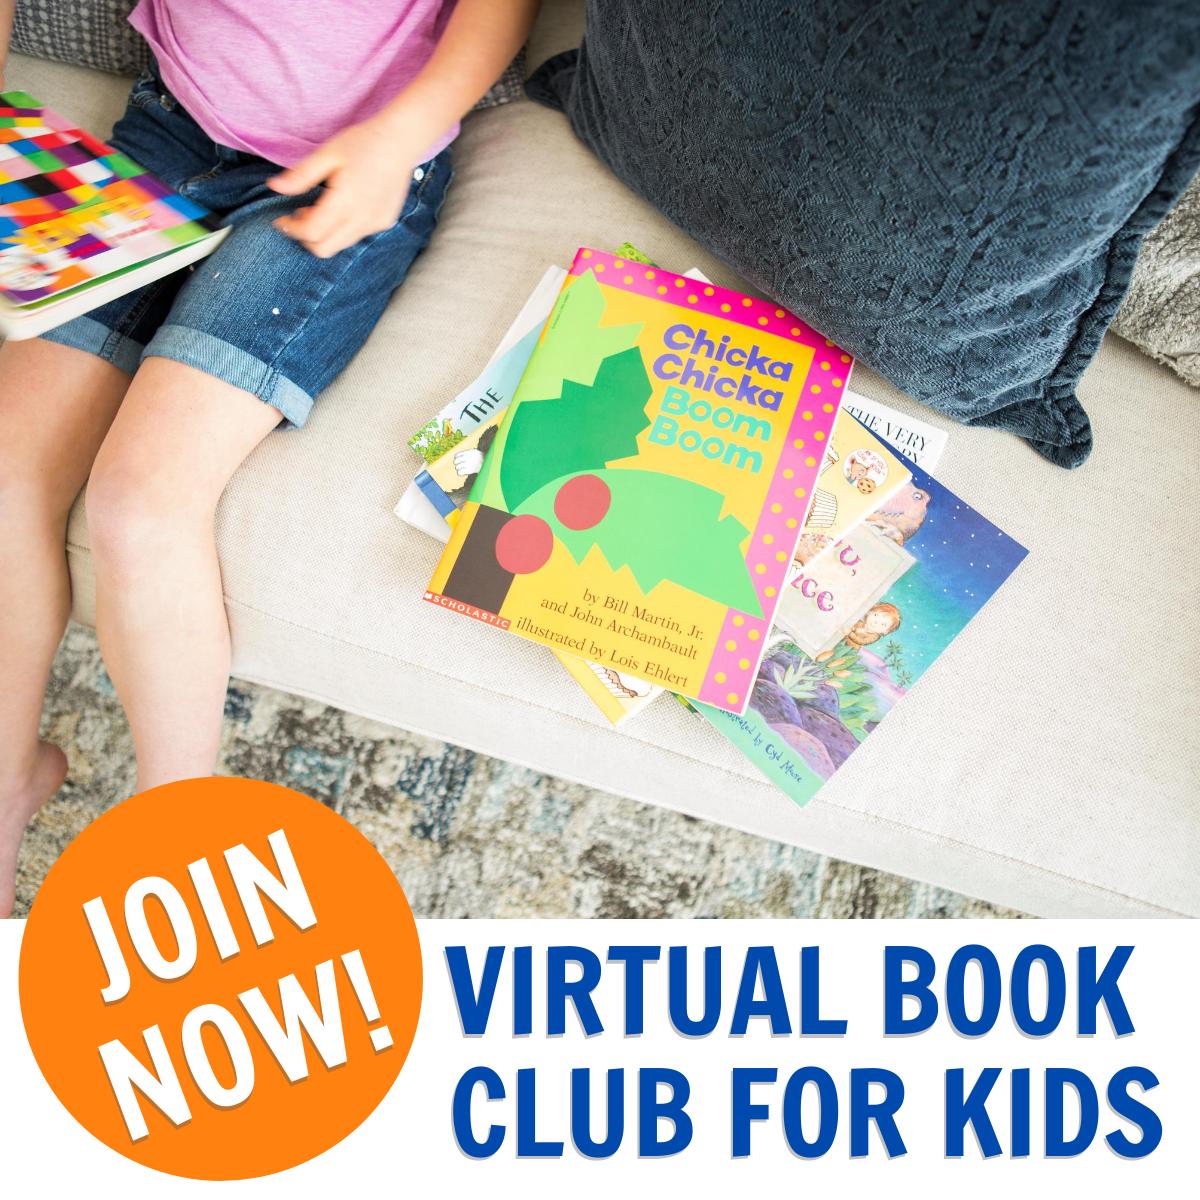 FREE Weekly Preschool Virtual Book Club for Kids 2021 - 2022